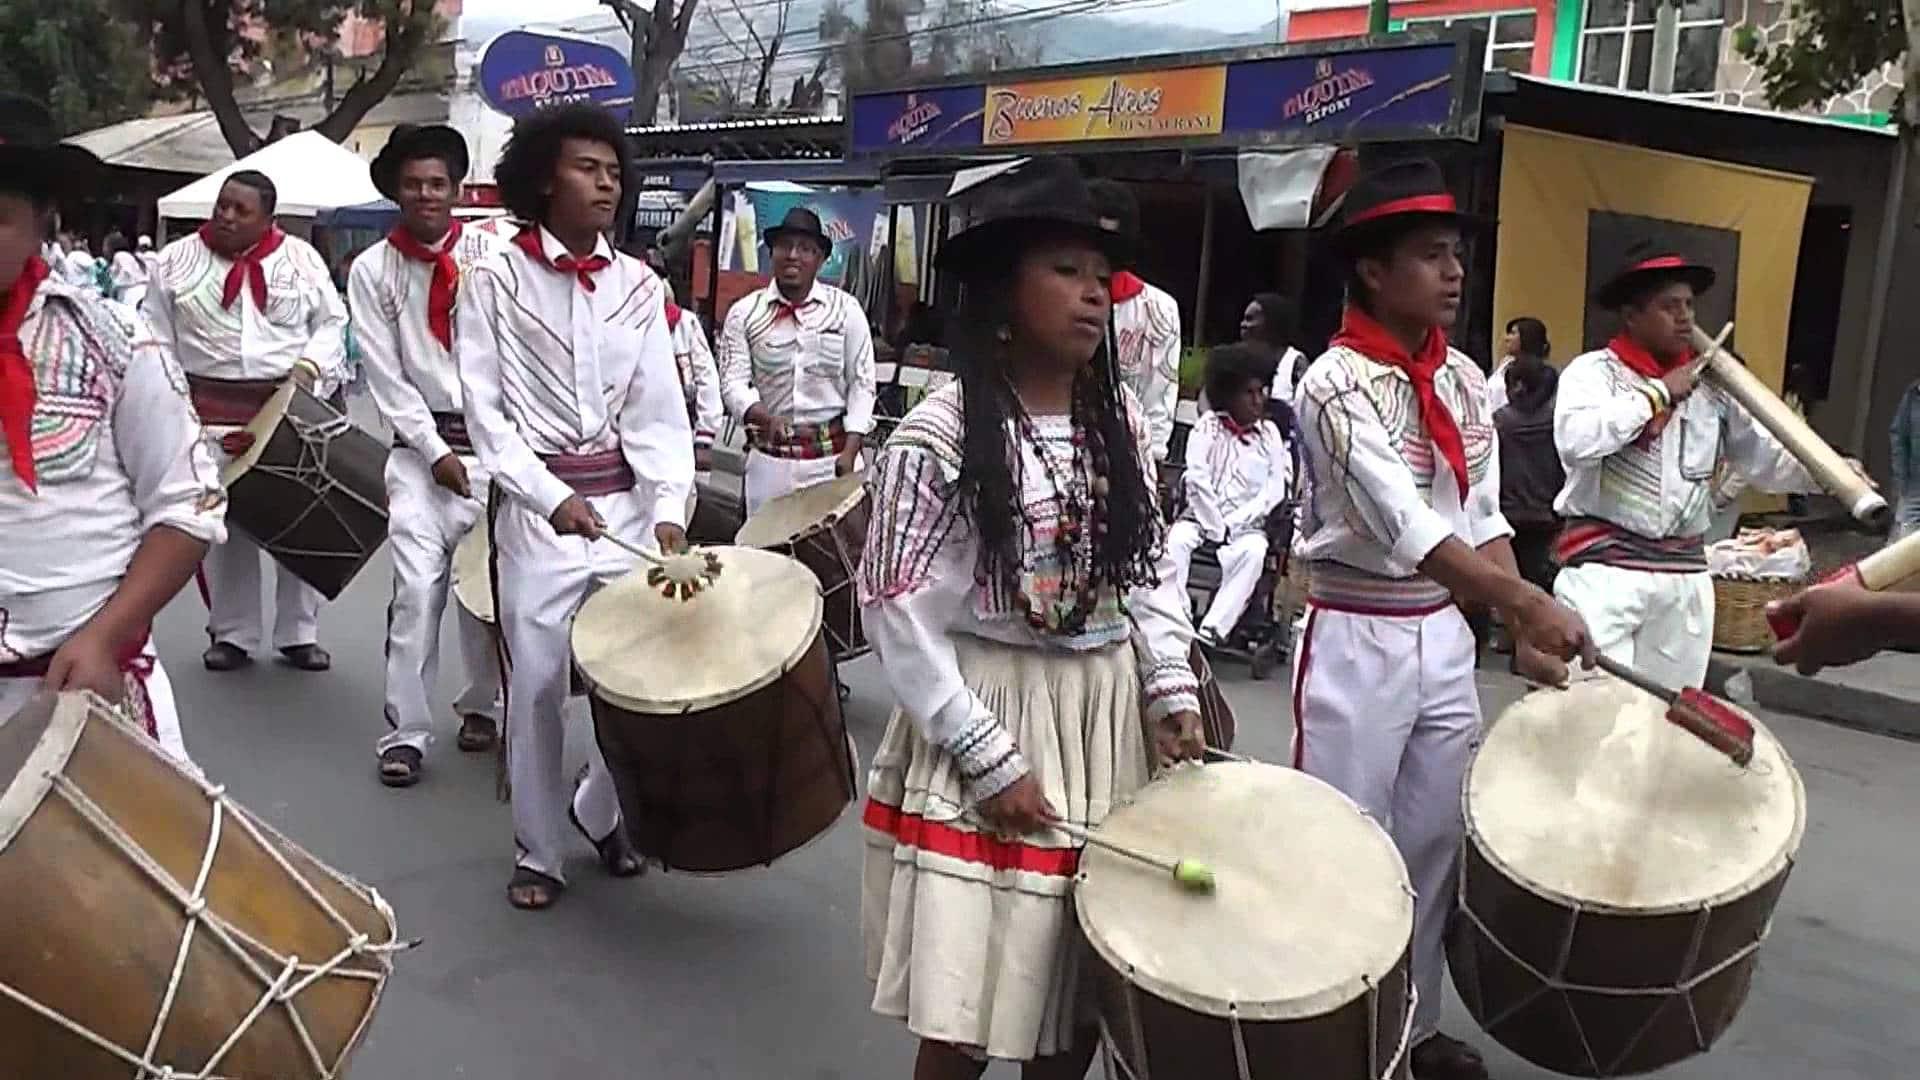 People dancing Saya on the street